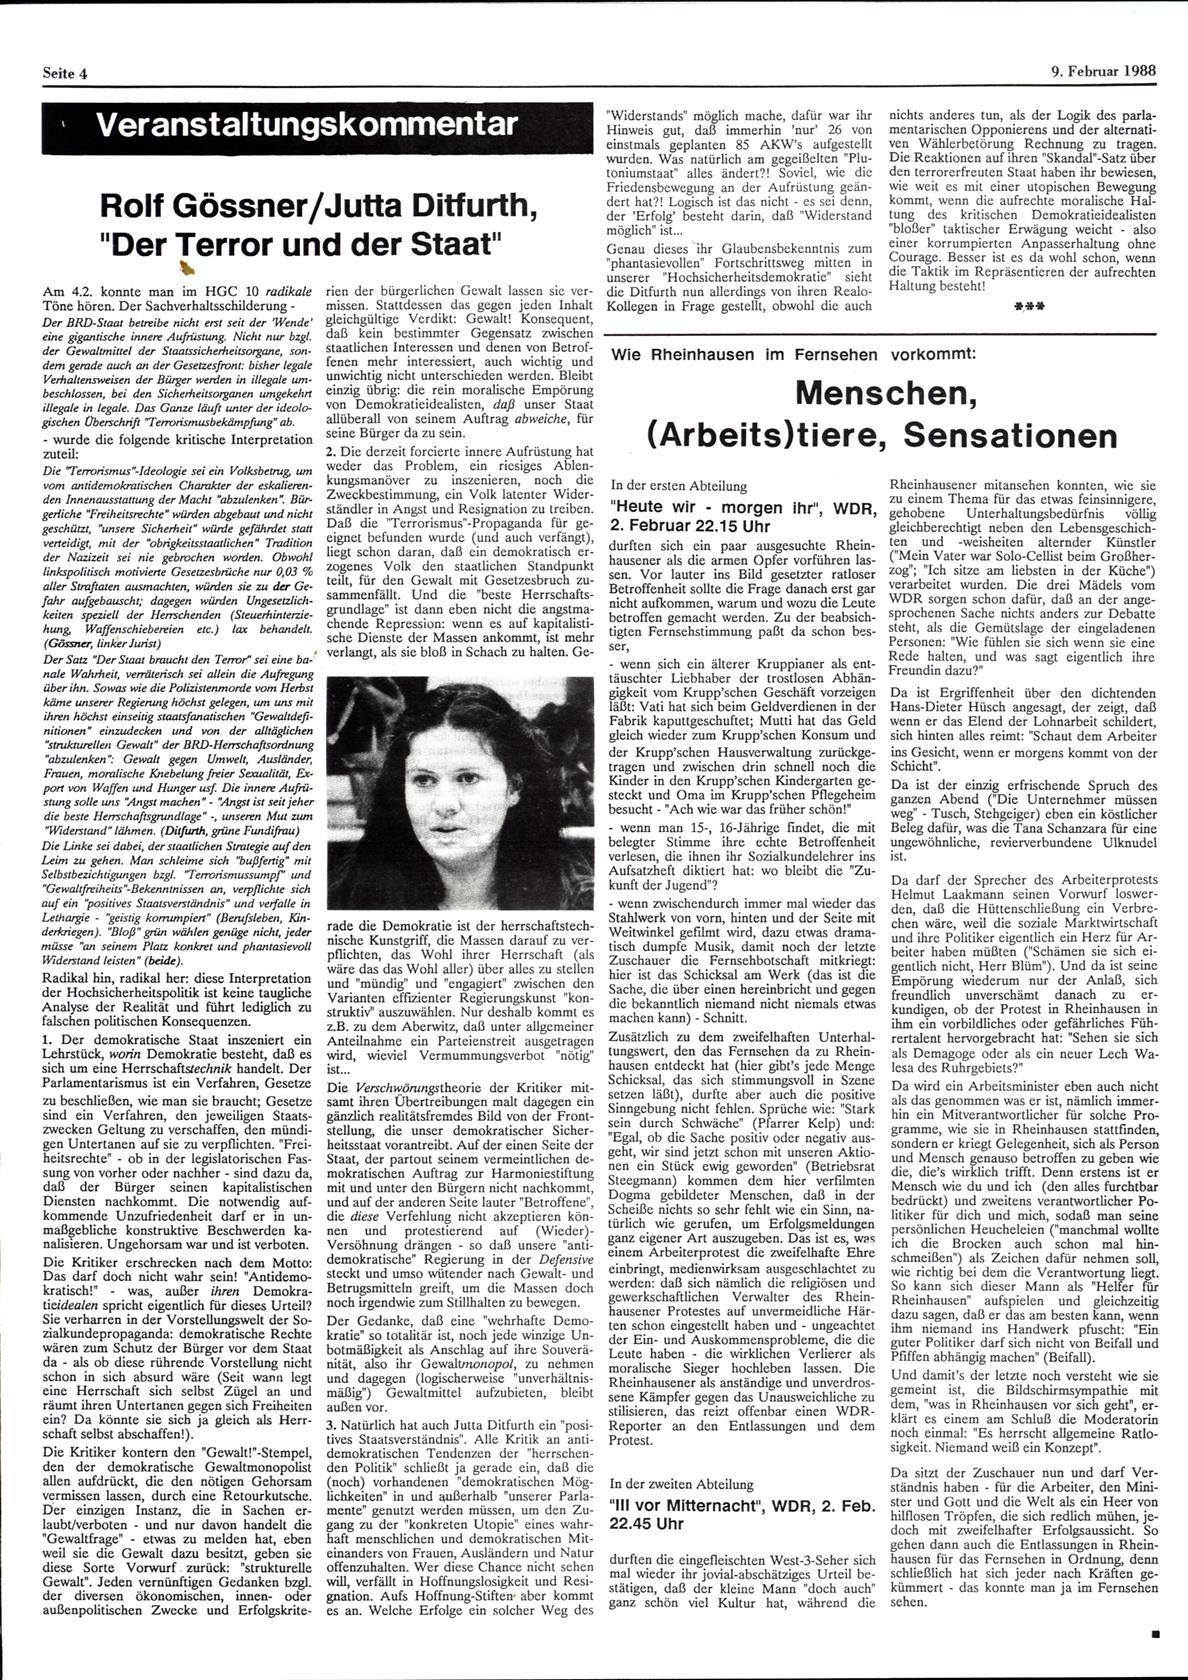 Bochum_BHZ_19880209_165_004